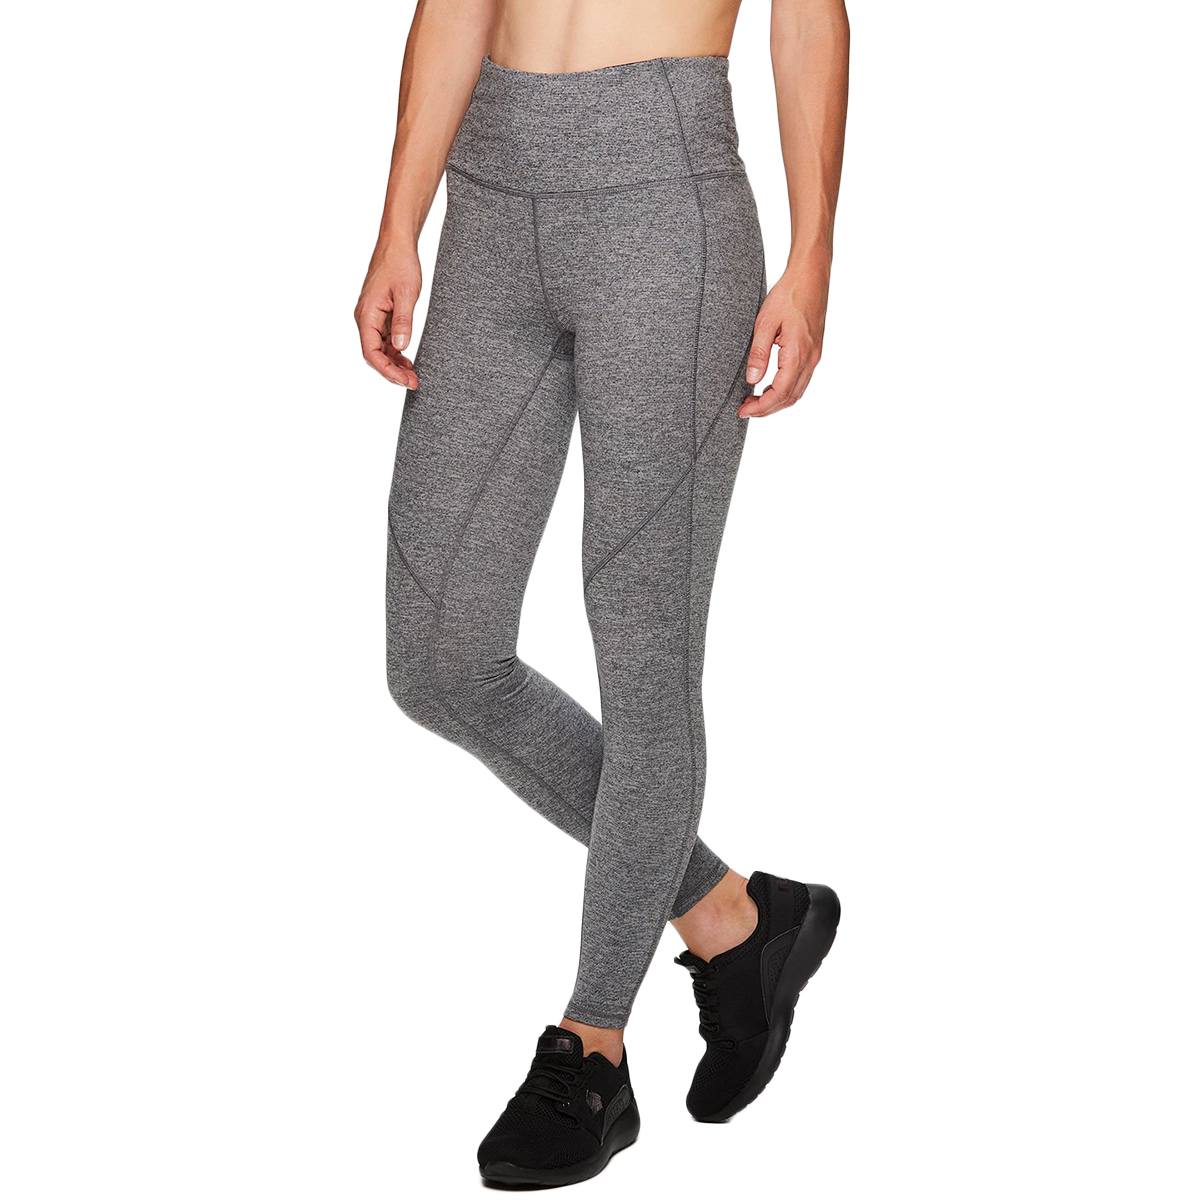 RBX Women's Stratus Leg Up High Waist Leggings - Black, L